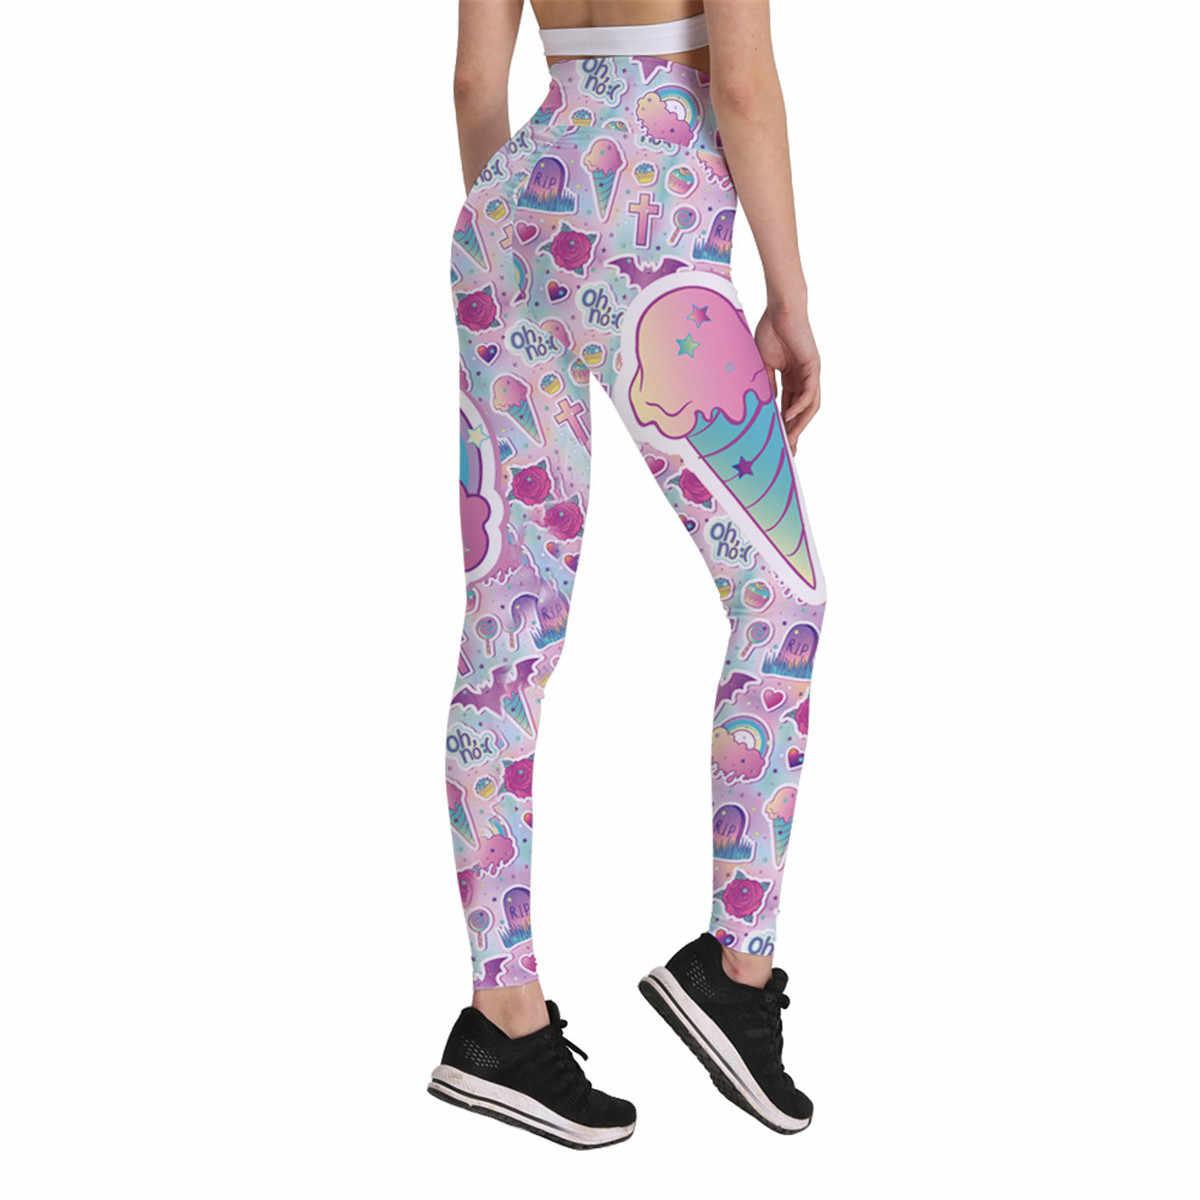 84d6407f802090 Women High Waist Leggings Cute Cartoon Icecream Rainbow Pink Print Push Up  Workout Leggings Mujer Wrinkle